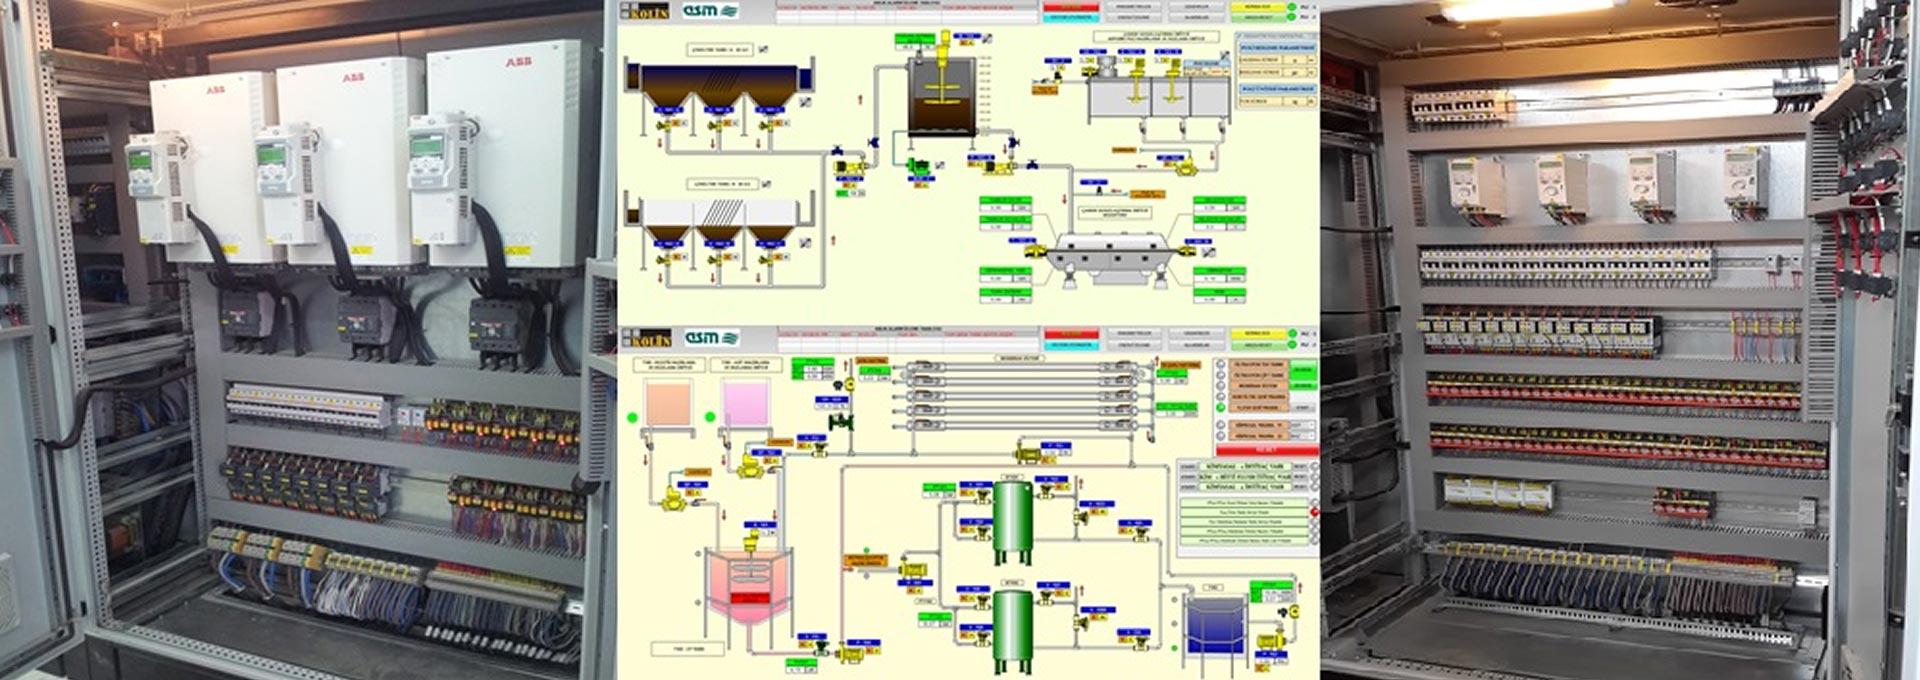 PLC, Otomasyon Scada ve Pano İmalatı